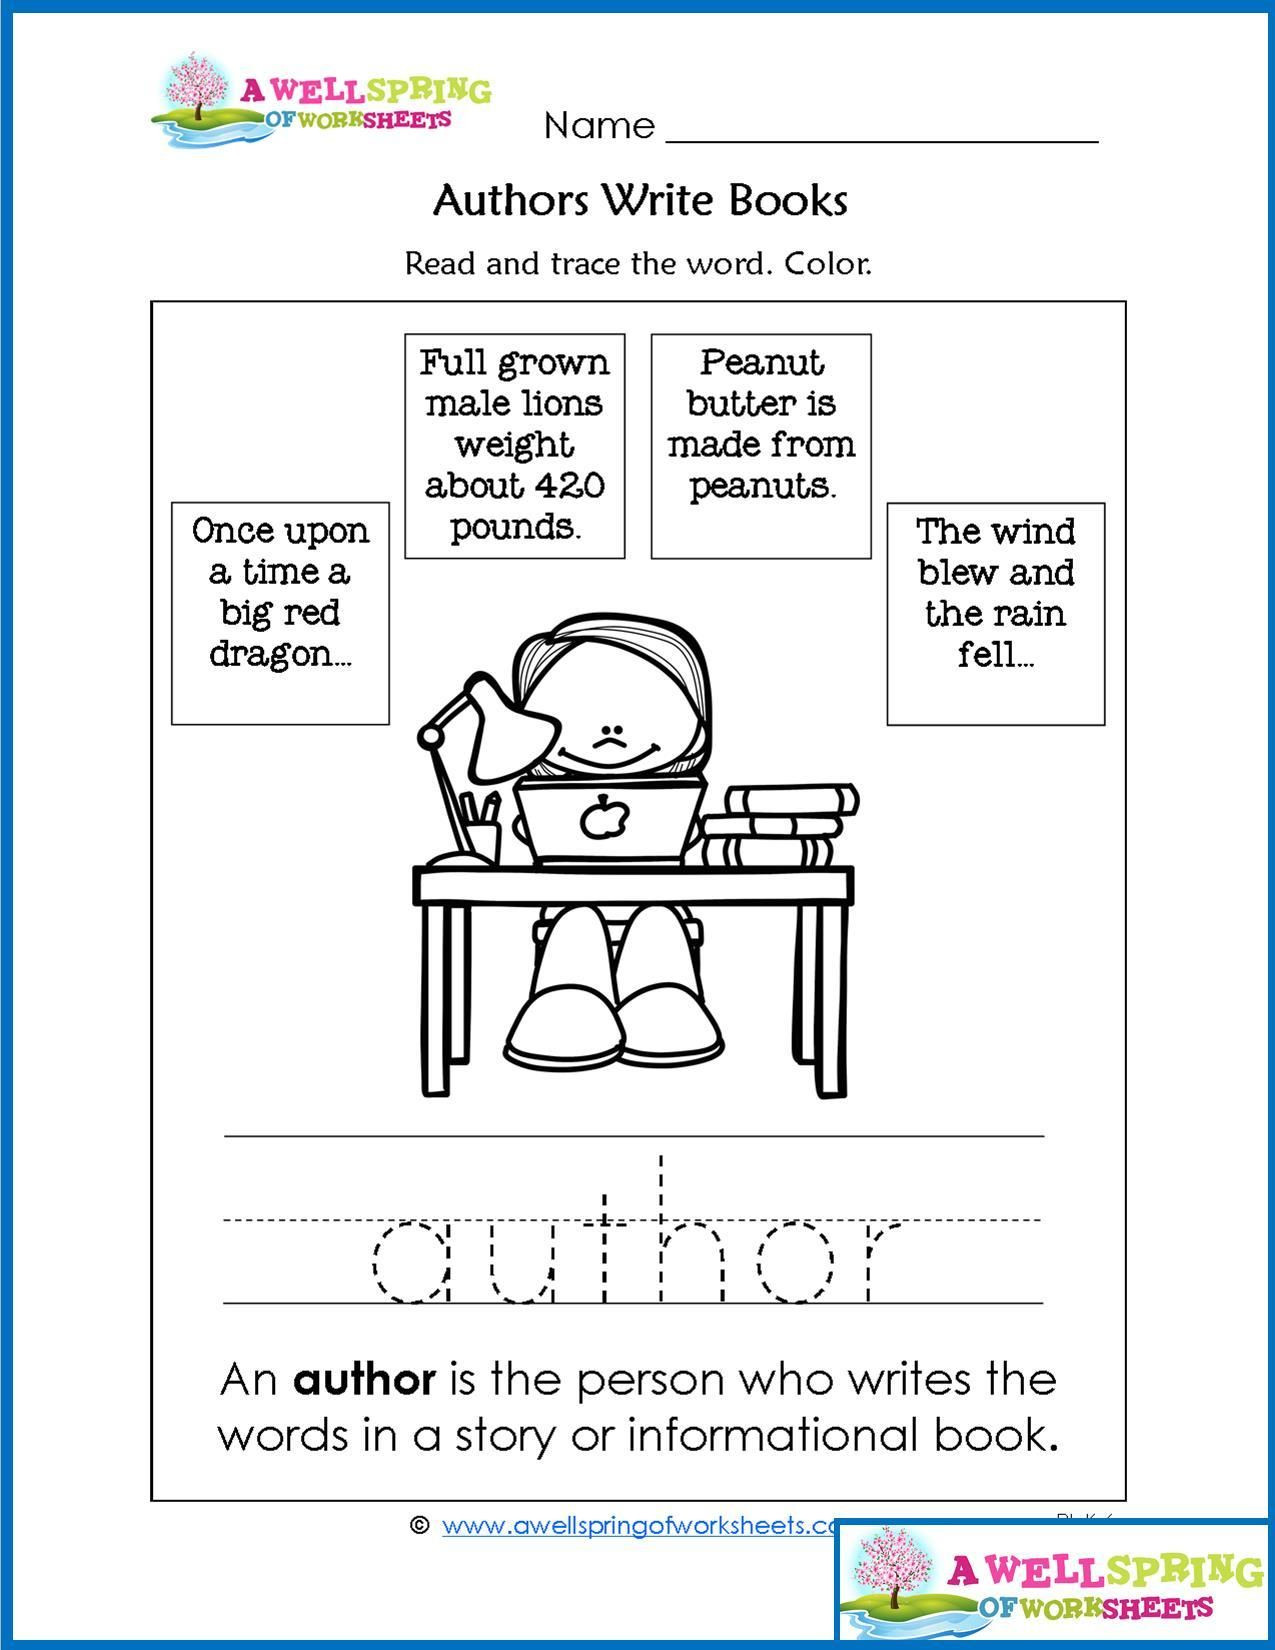 Listening Center Response Sheet Kindergarten Worksheets by Subject